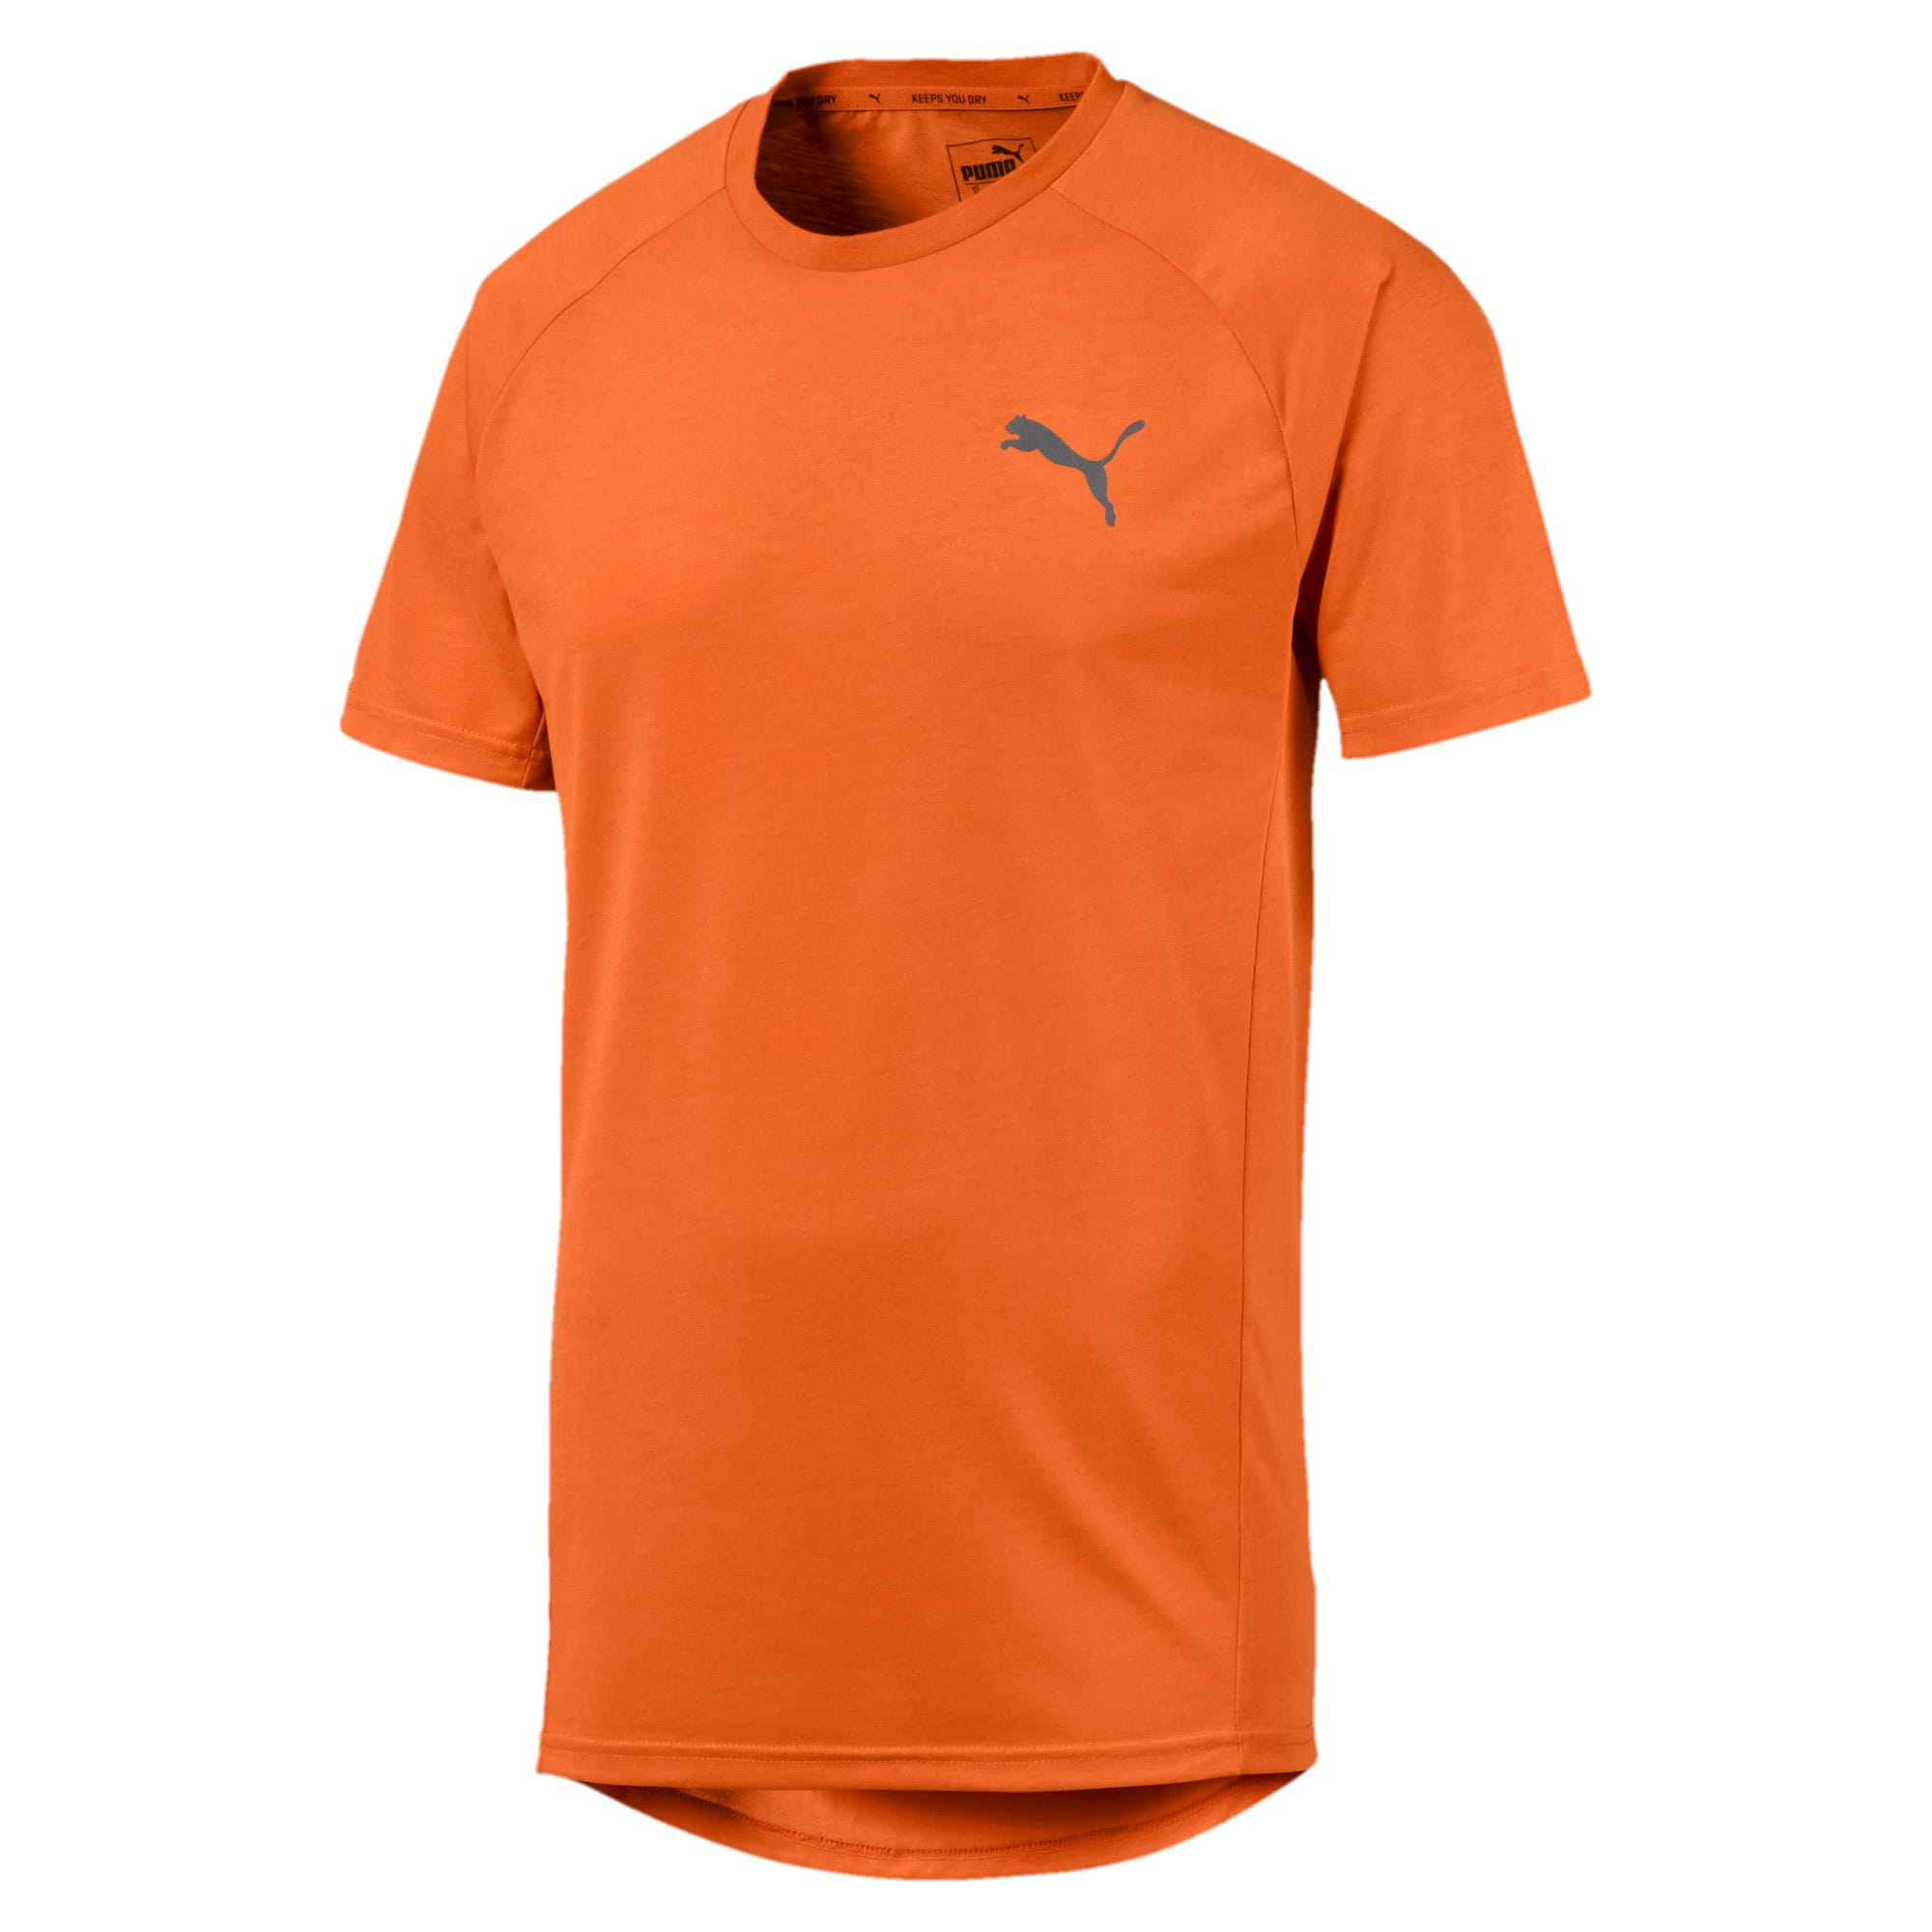 Thumbnail 4 of Meska koszulka z krótkim rekawem Evostripe, Jaffa Orange, medium